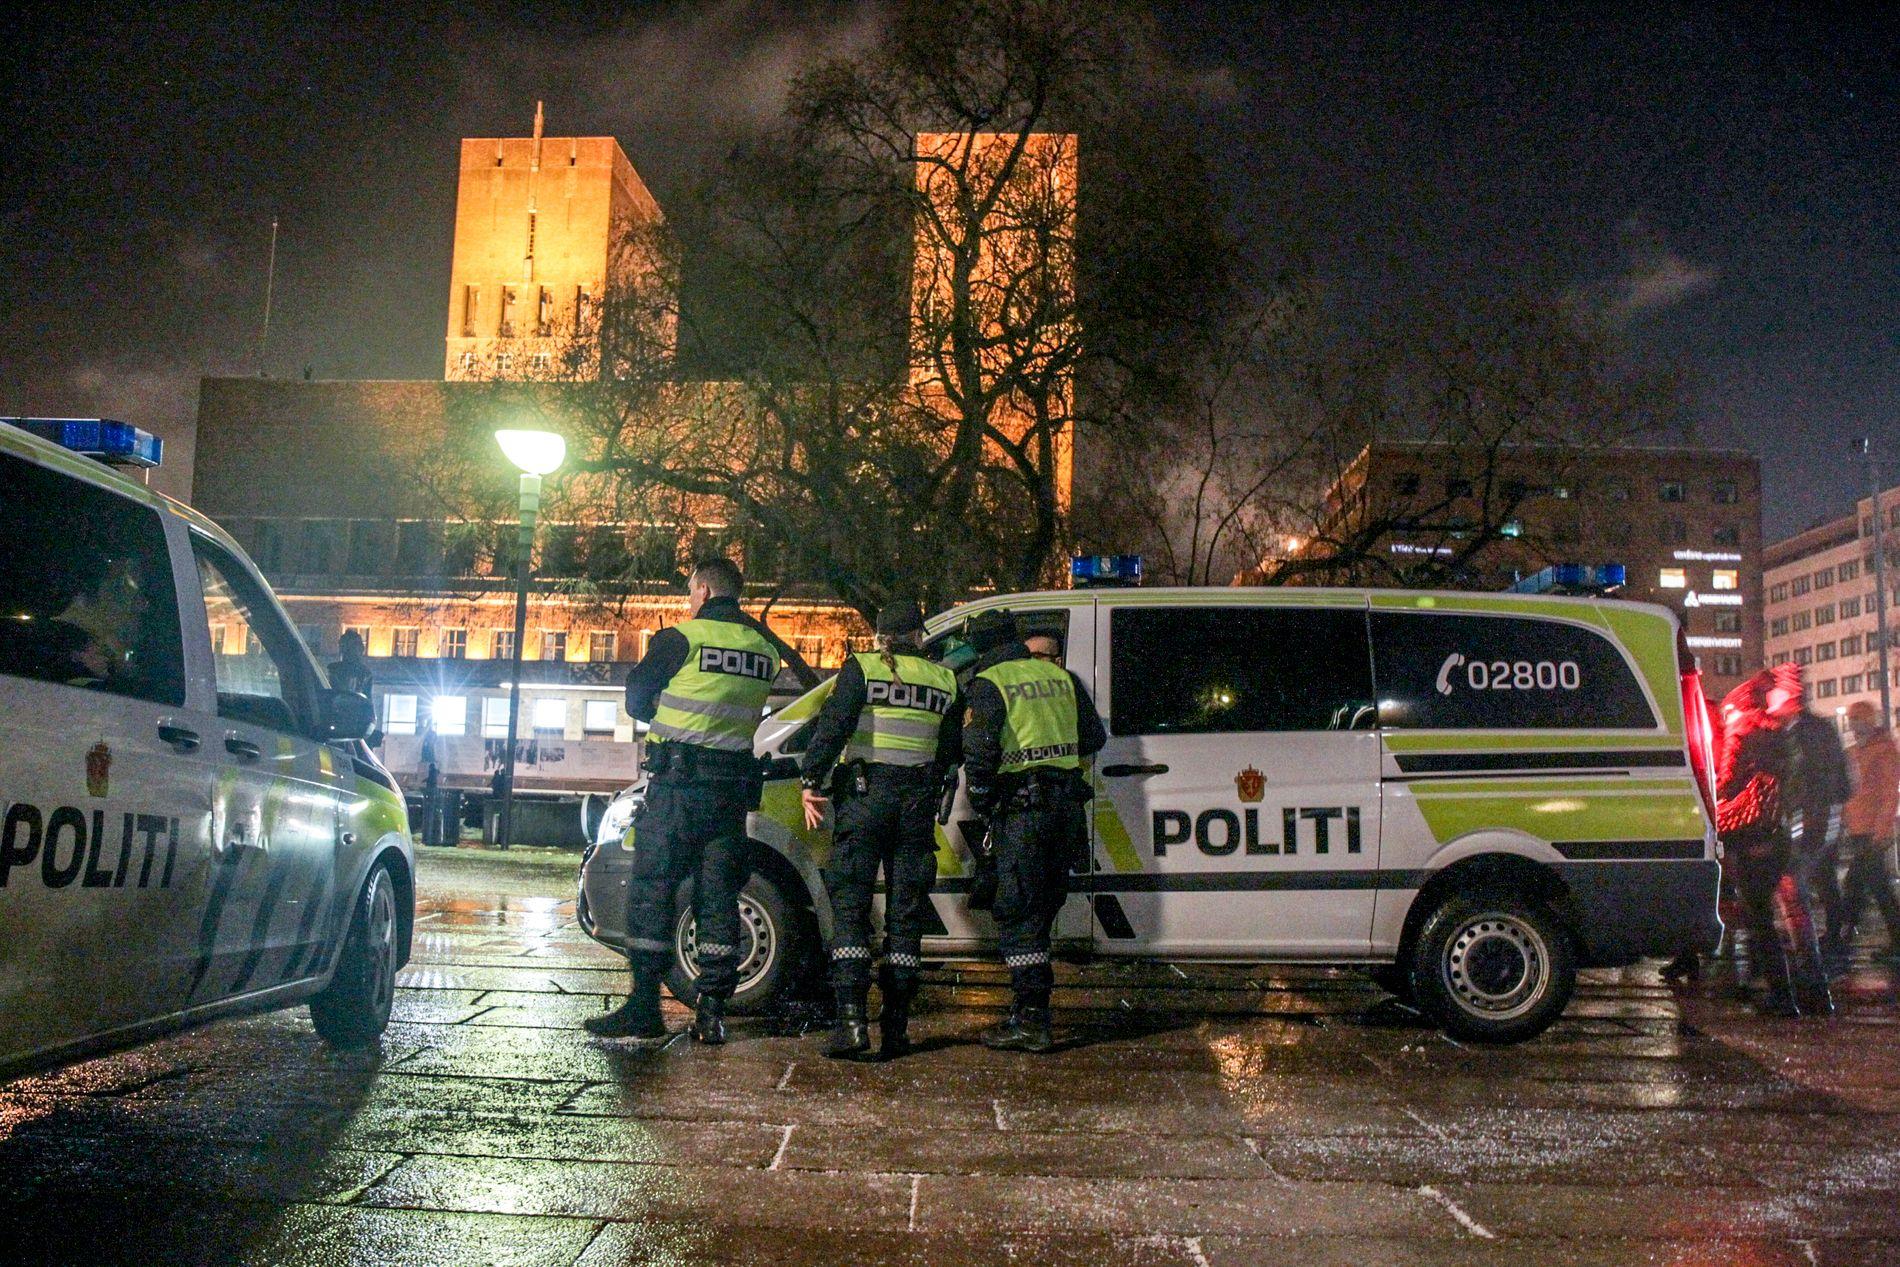 PARAT: Politiet er på plass på Rådhusplassen i Oslo før det store fyrverkeriet midnatt.